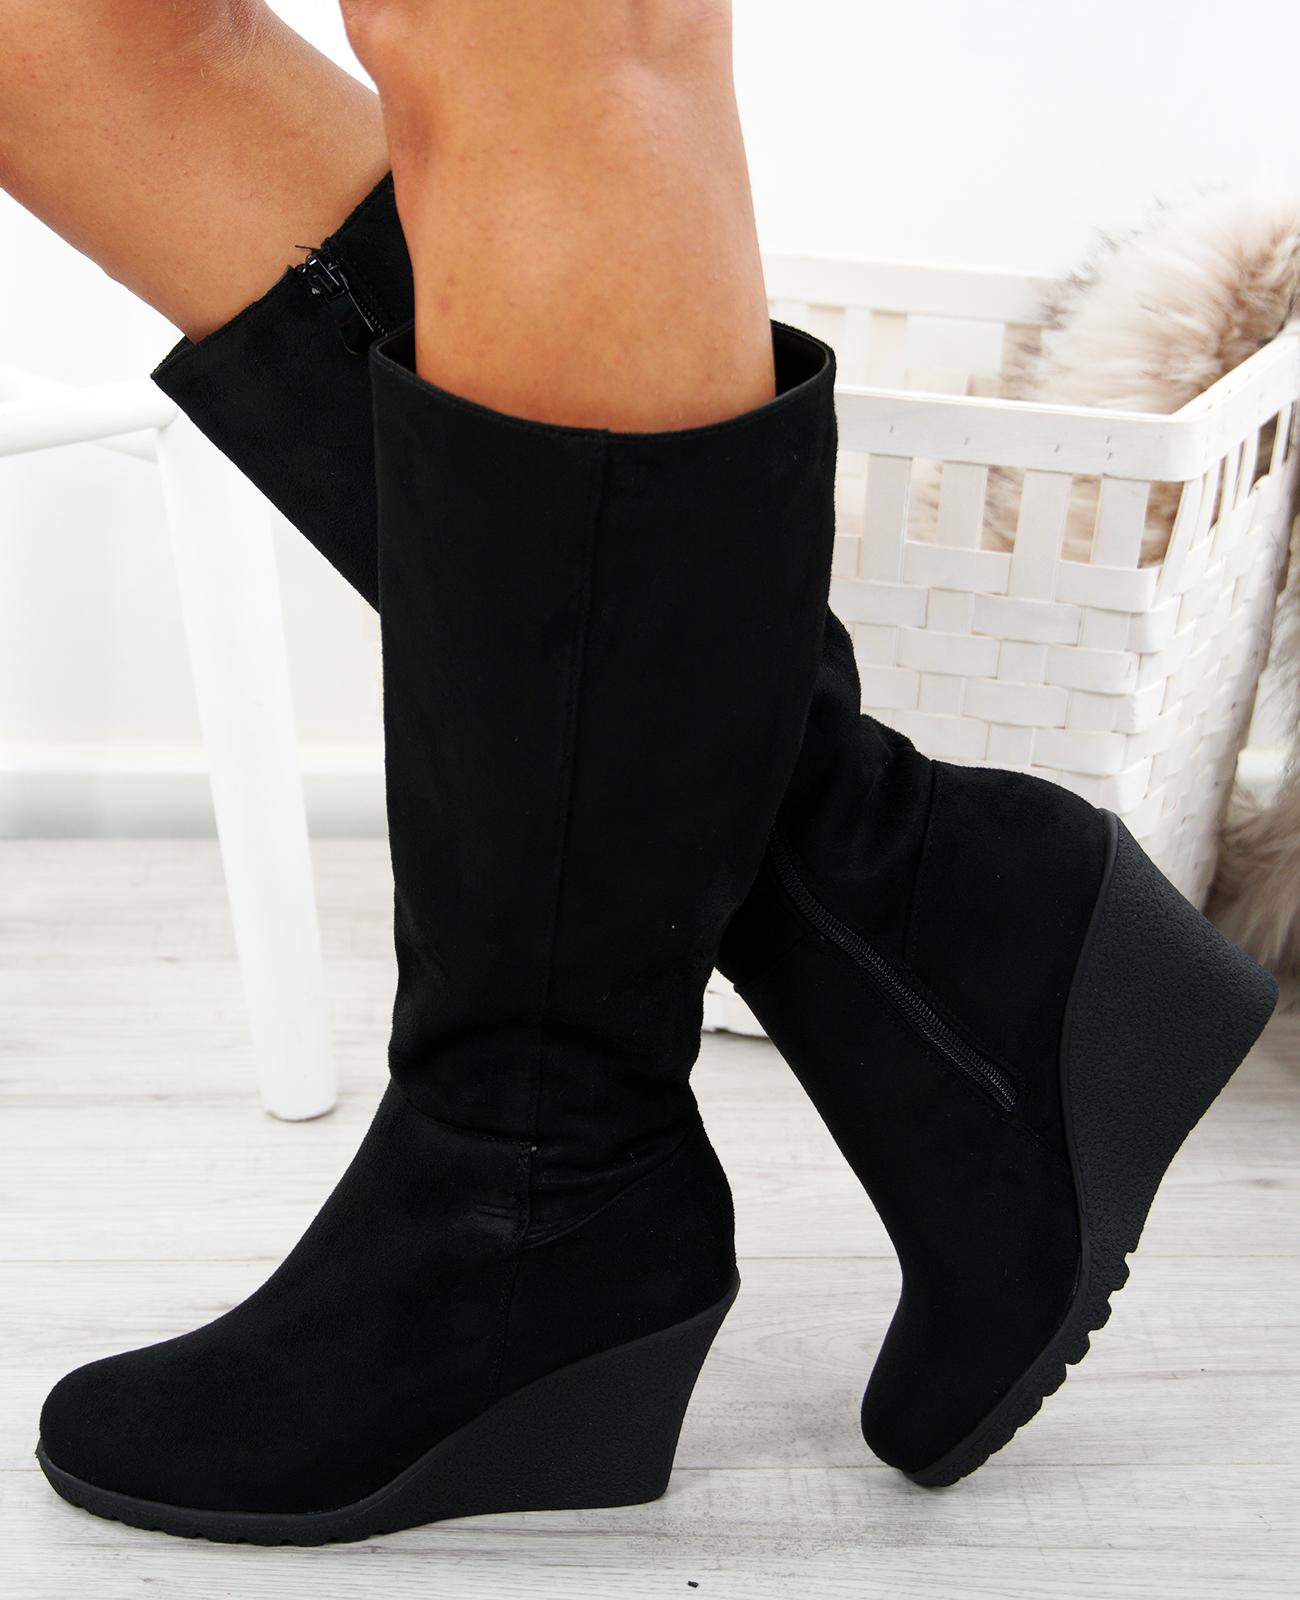 a98dba9a527 WOMENS WEDGE BOOTS LADIES LONG KNEE HIGH BOOT PLATFORM WINTER ...